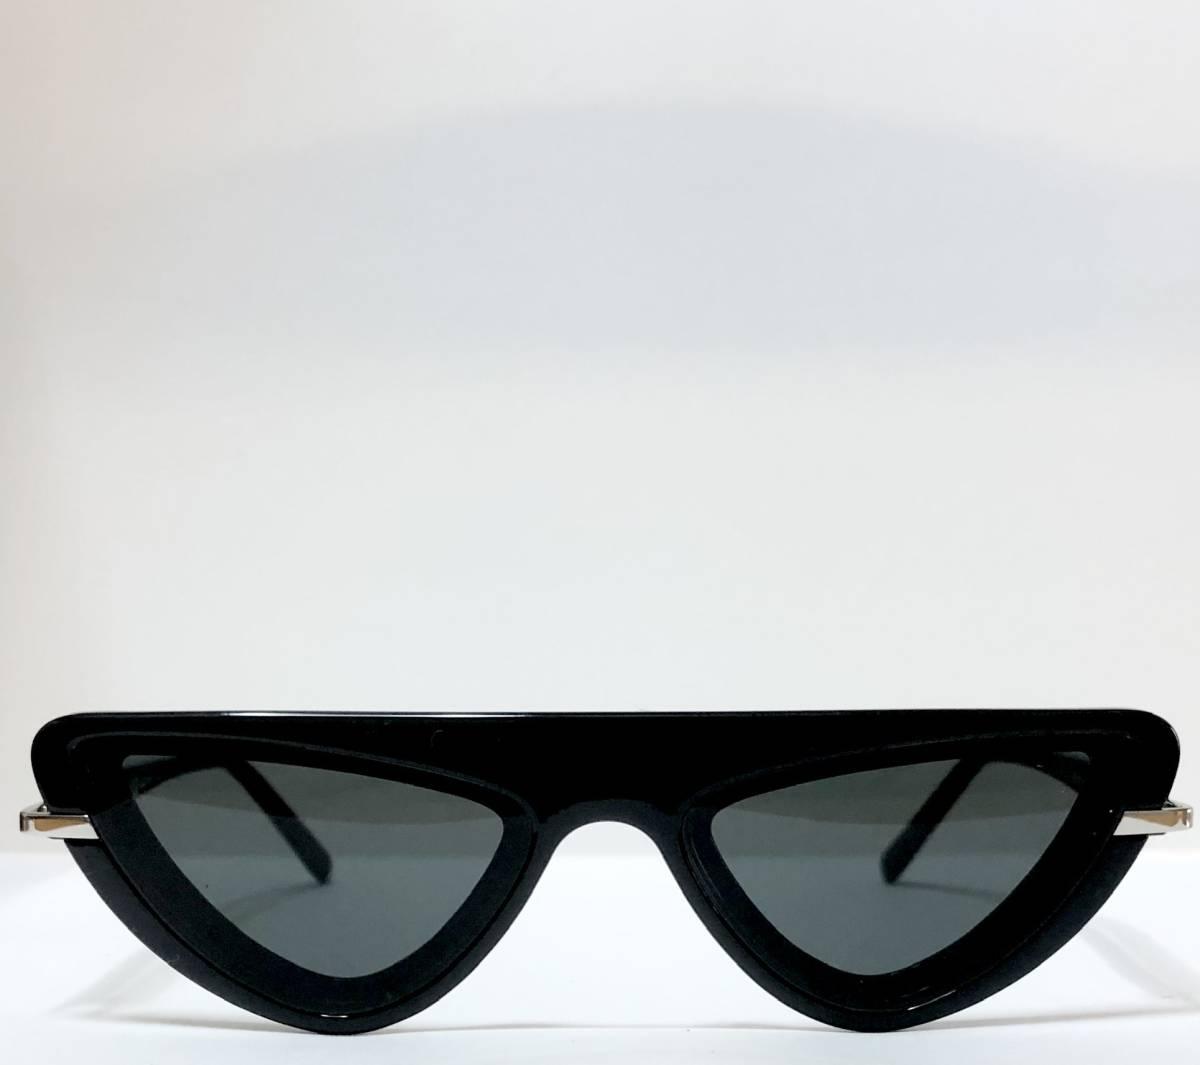 CK カルバンクライン 芸術的なサングラス イタリア製 純正・新品 ケース付き 米国ブランド Calvin Klein メガネ可能_画像1